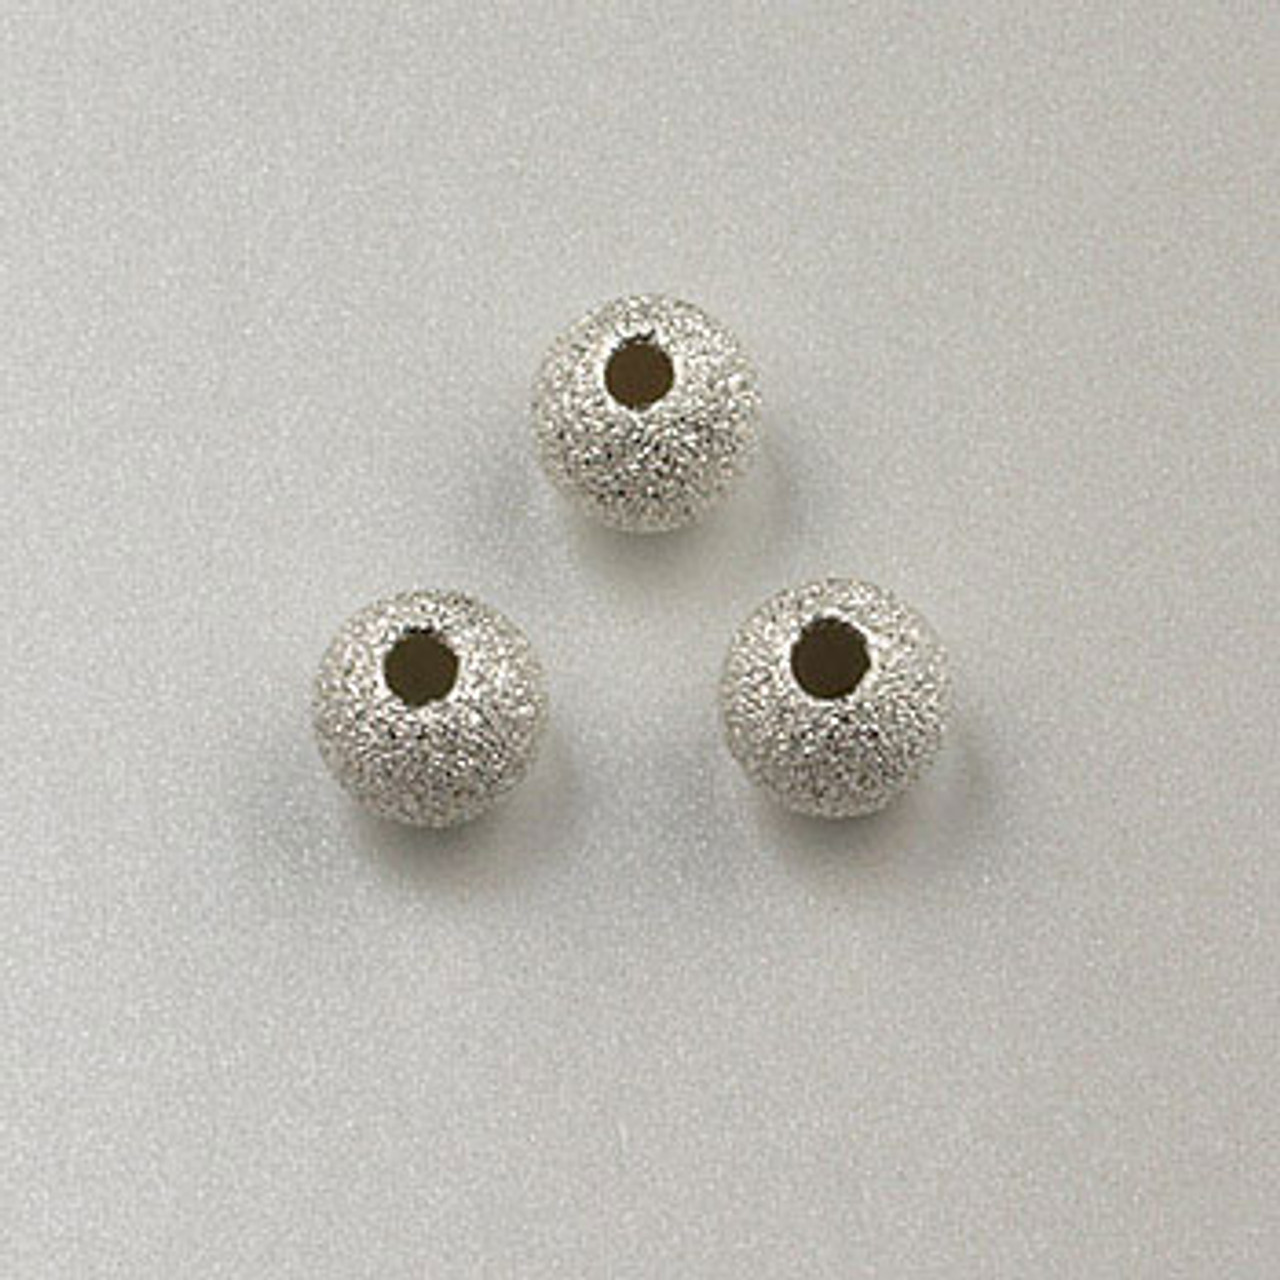 3mm Sterling Silver Roundel Beads Pkg 25